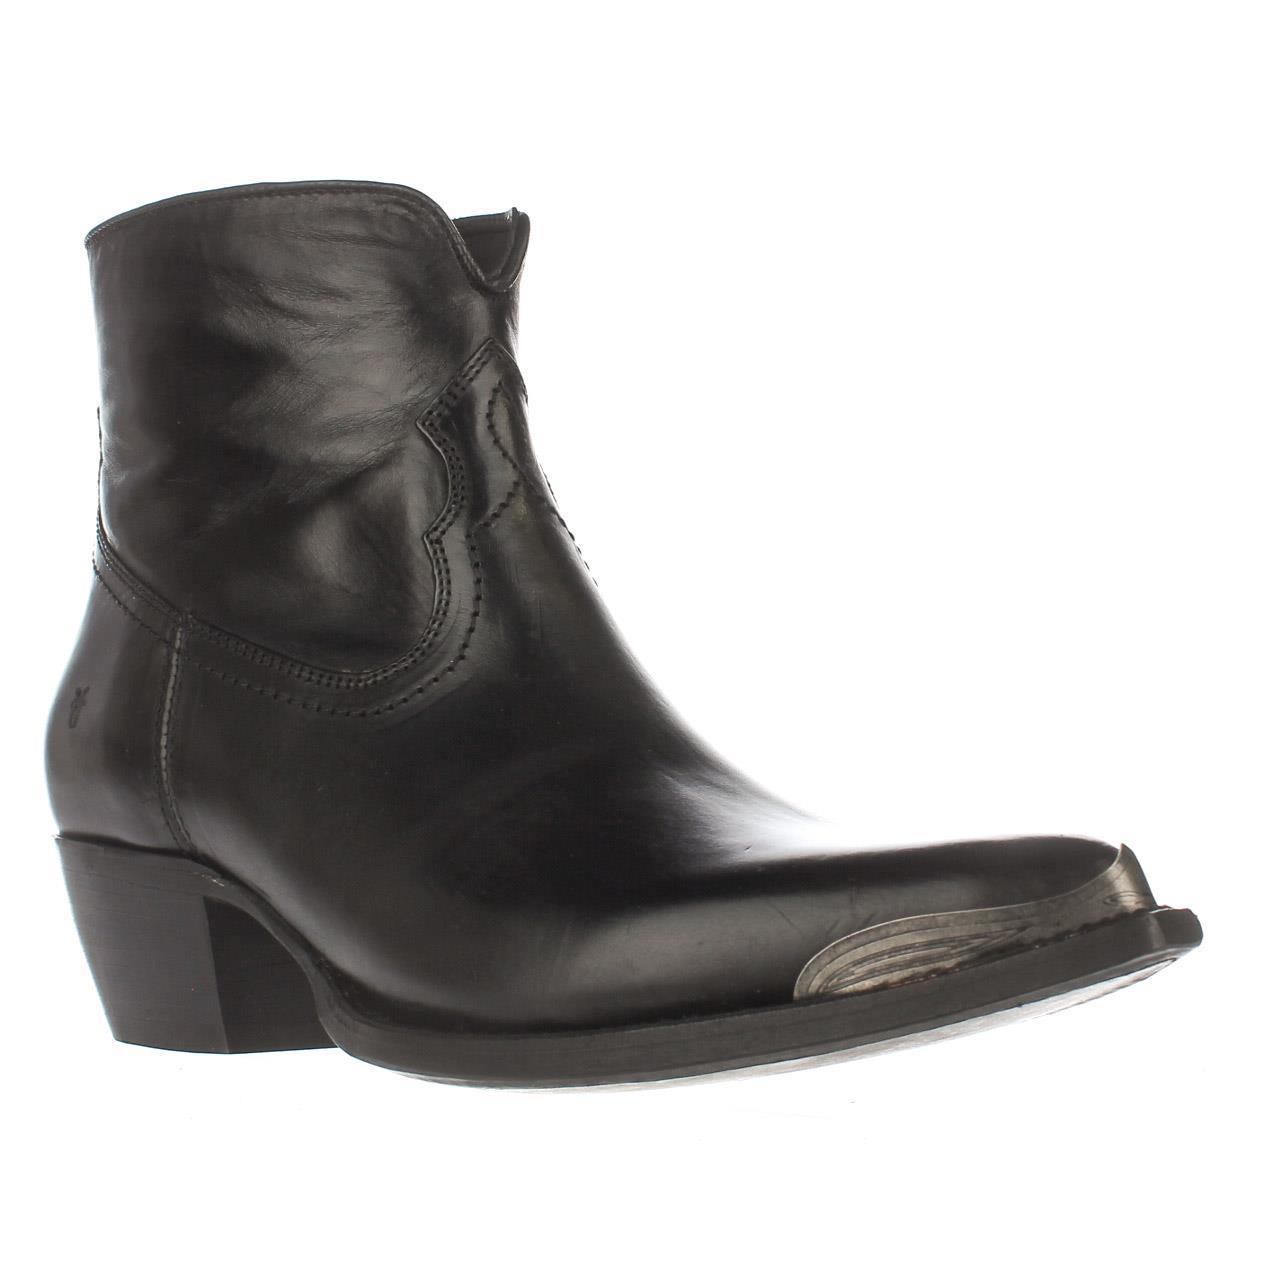 Womens FRYE Shane Tip Short Western Boots - Black